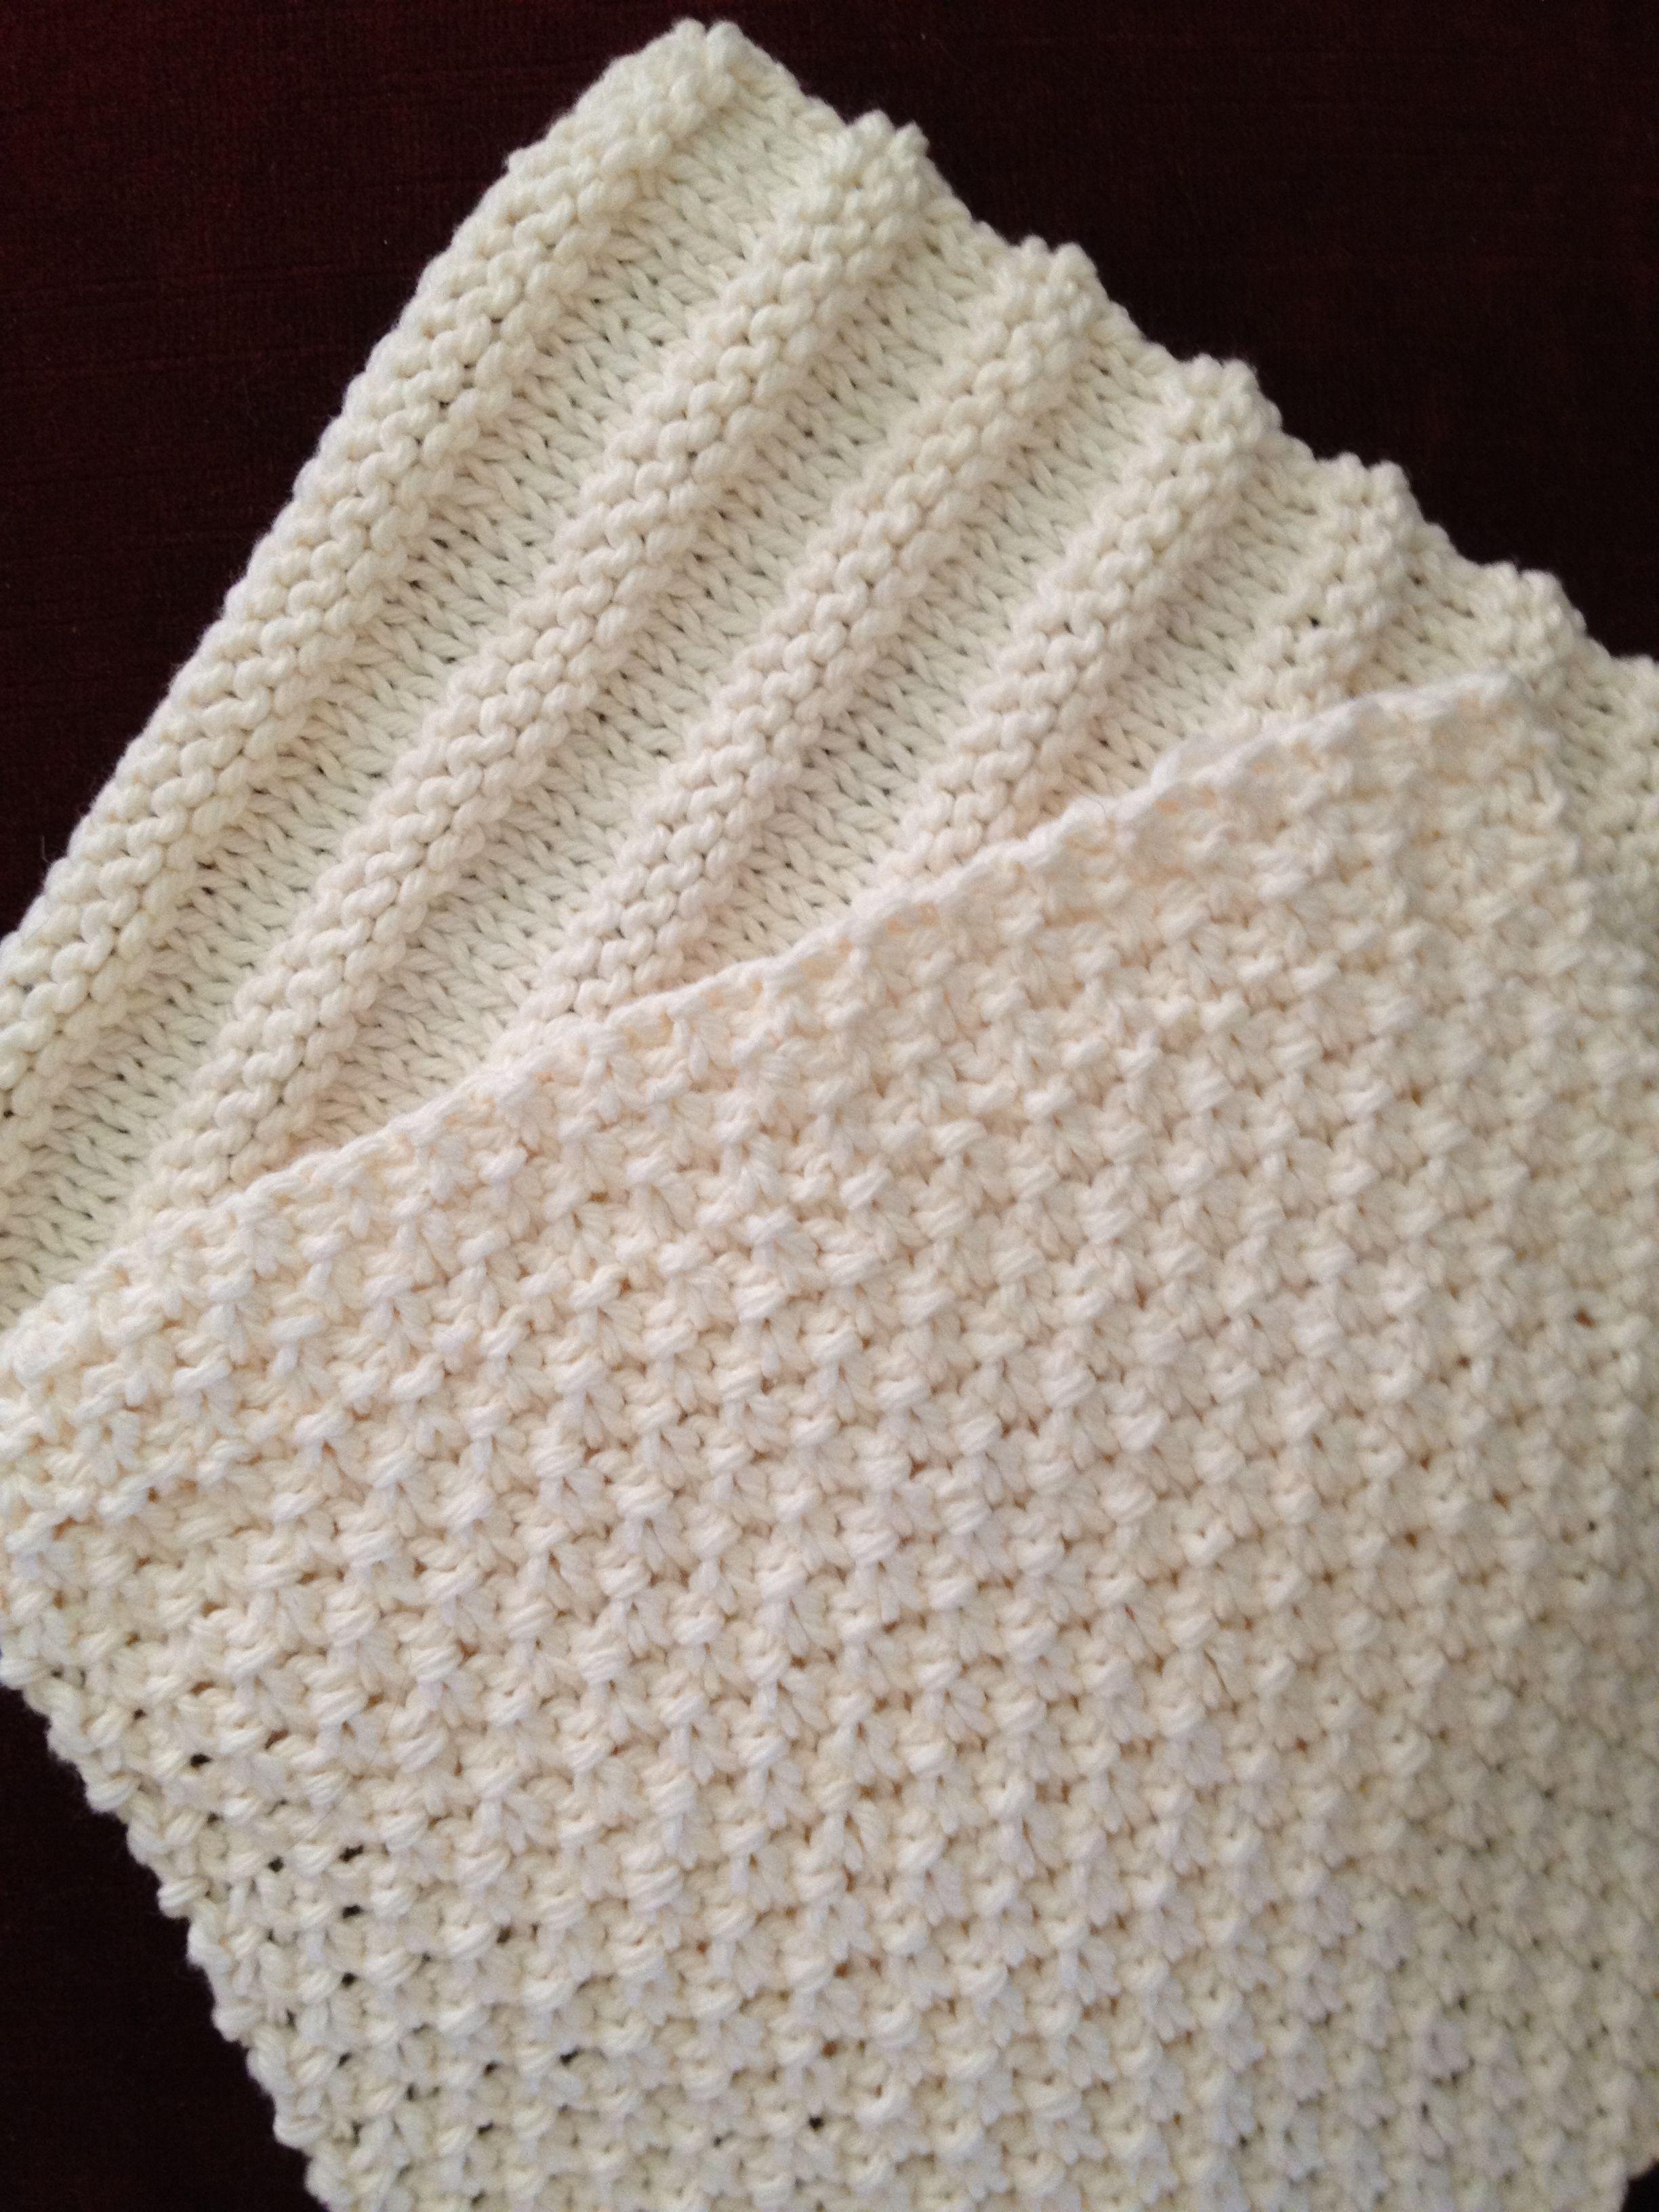 Washcloth Knitting Pattern Wash Cloth Quartet For Beginning Knitters Crochet Knitting